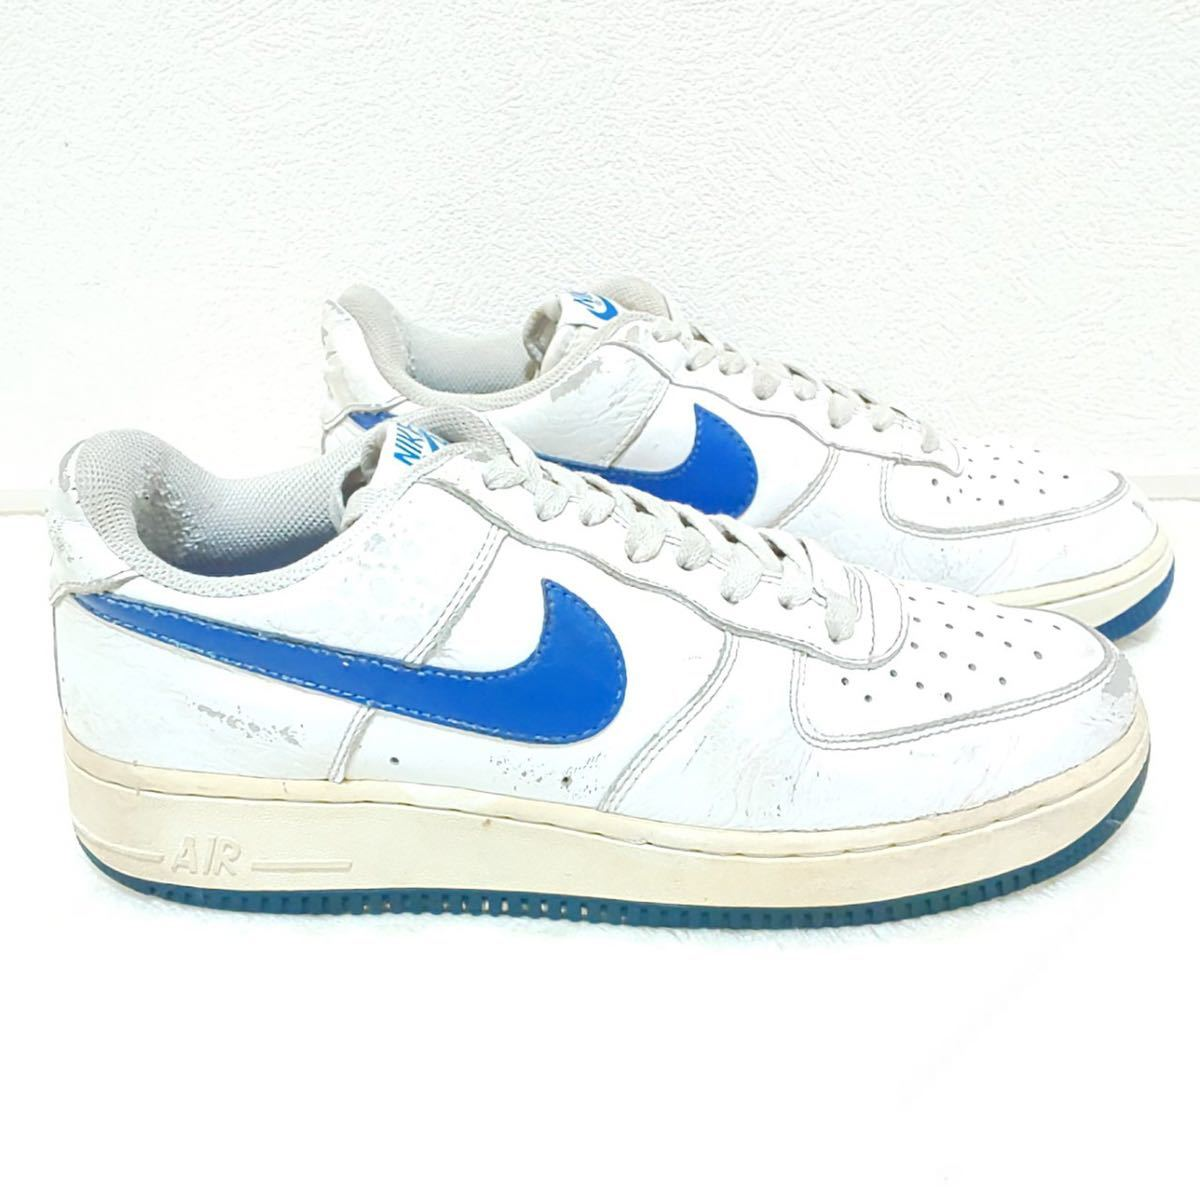 '07【NIKE】ナイキ AIR FORCE1 エアーフォースワン ローカット スニーカー シューズ 靴 ホワイト ブルー カジュアル ストリート 25.5cm/jx_画像2